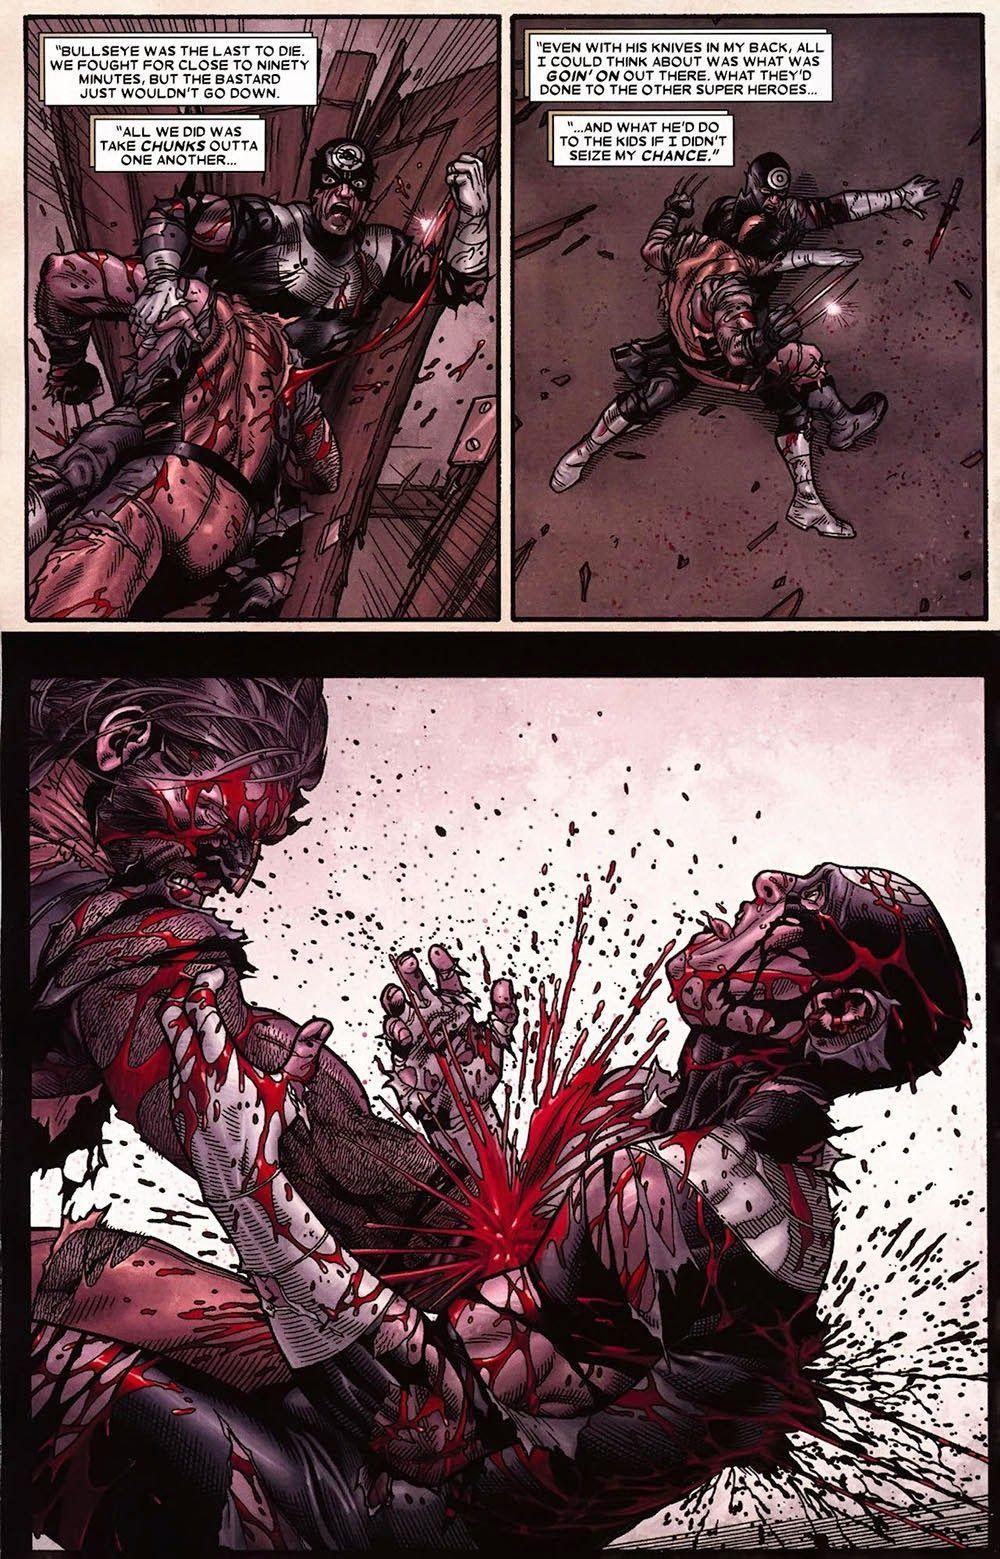 Old Man Logan 05 …………………………………… | Viewcomic reading comics